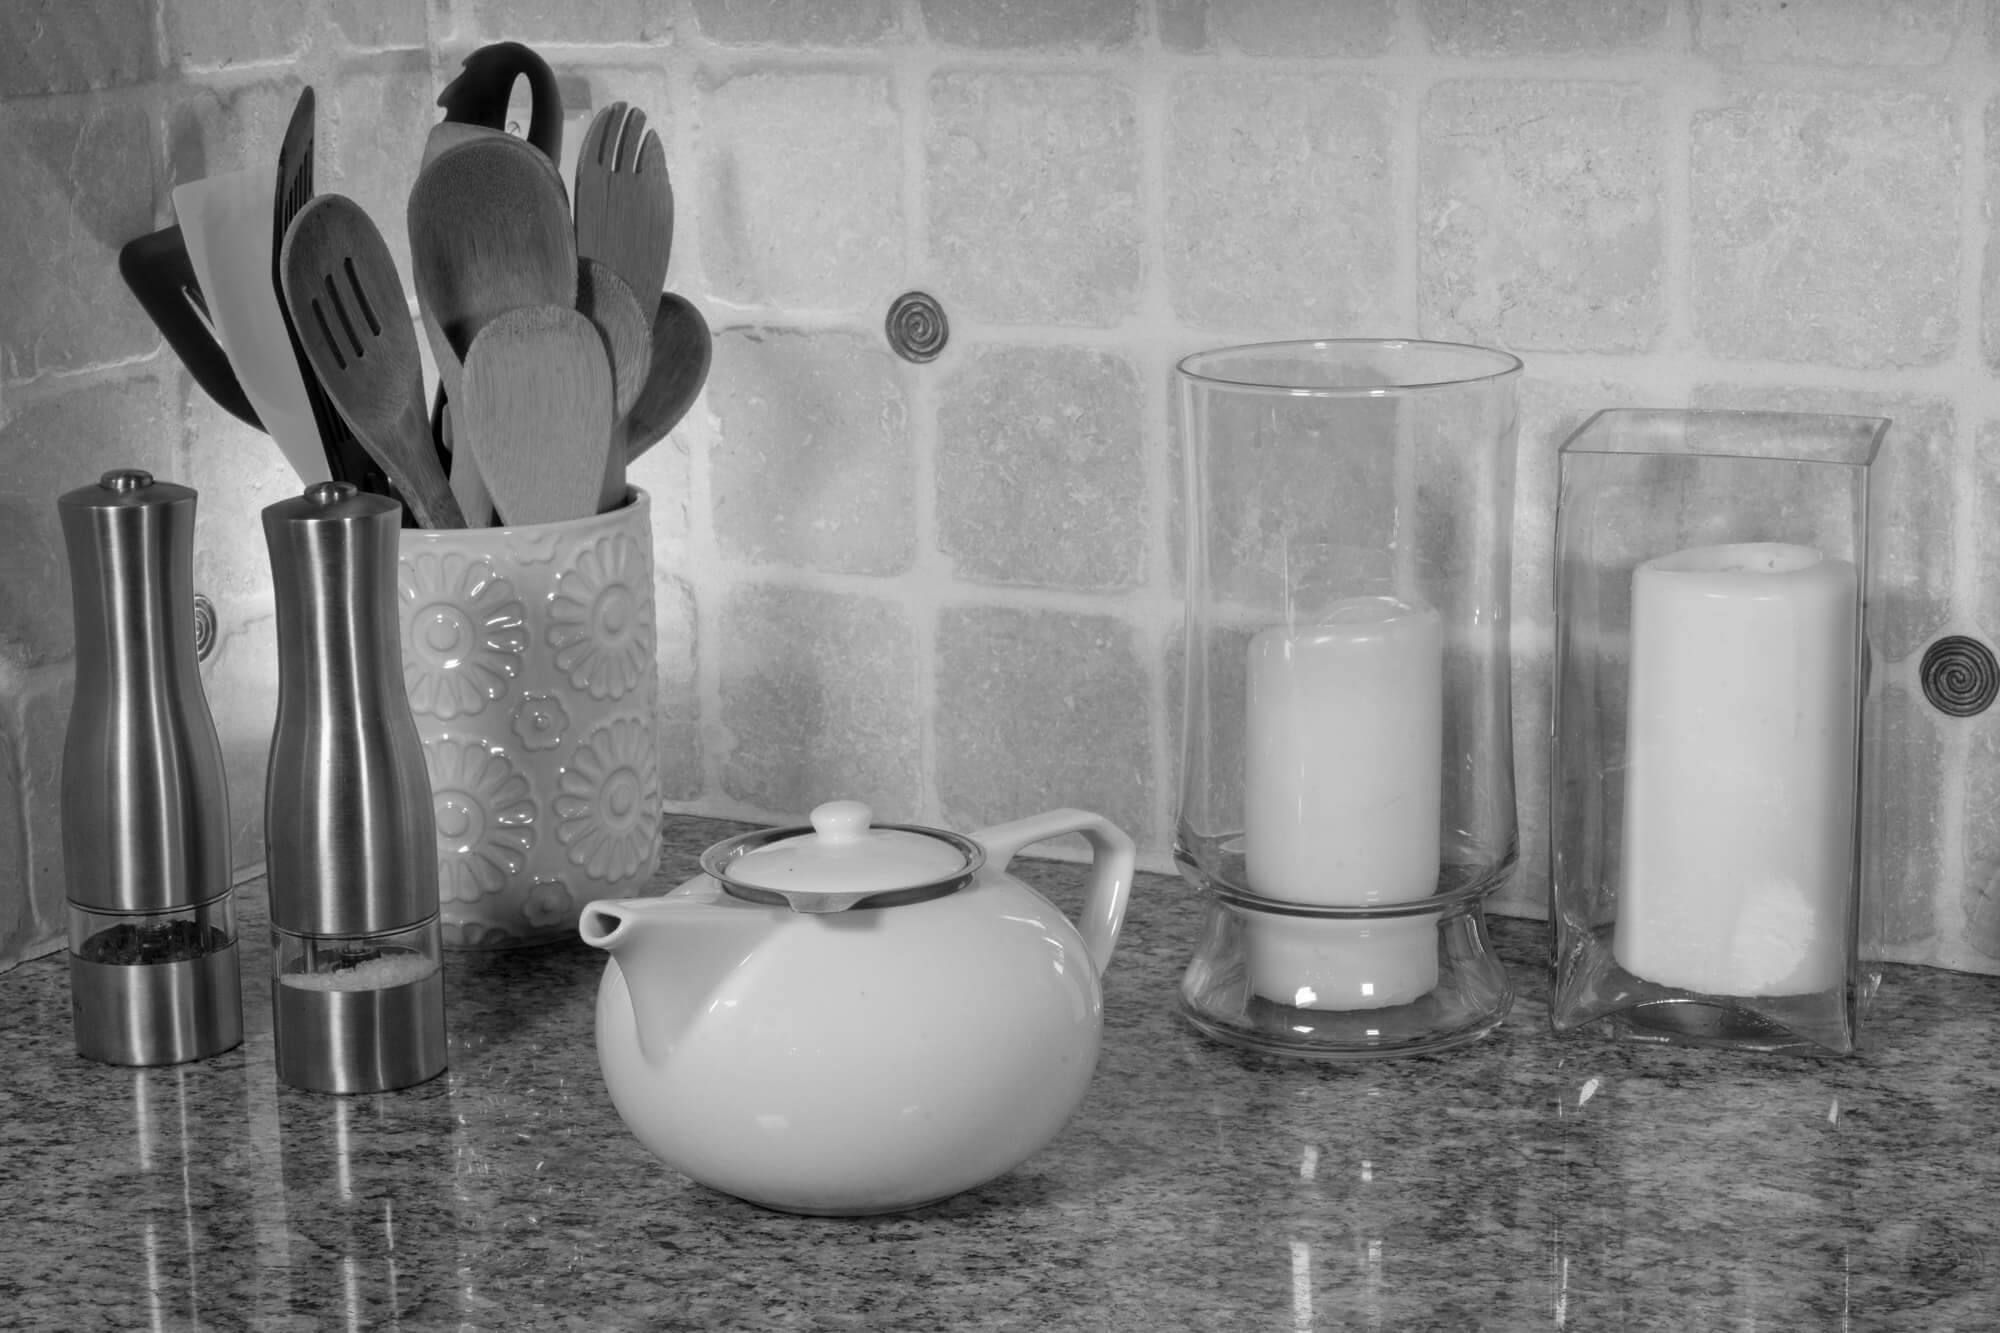 Kitchen Still Life